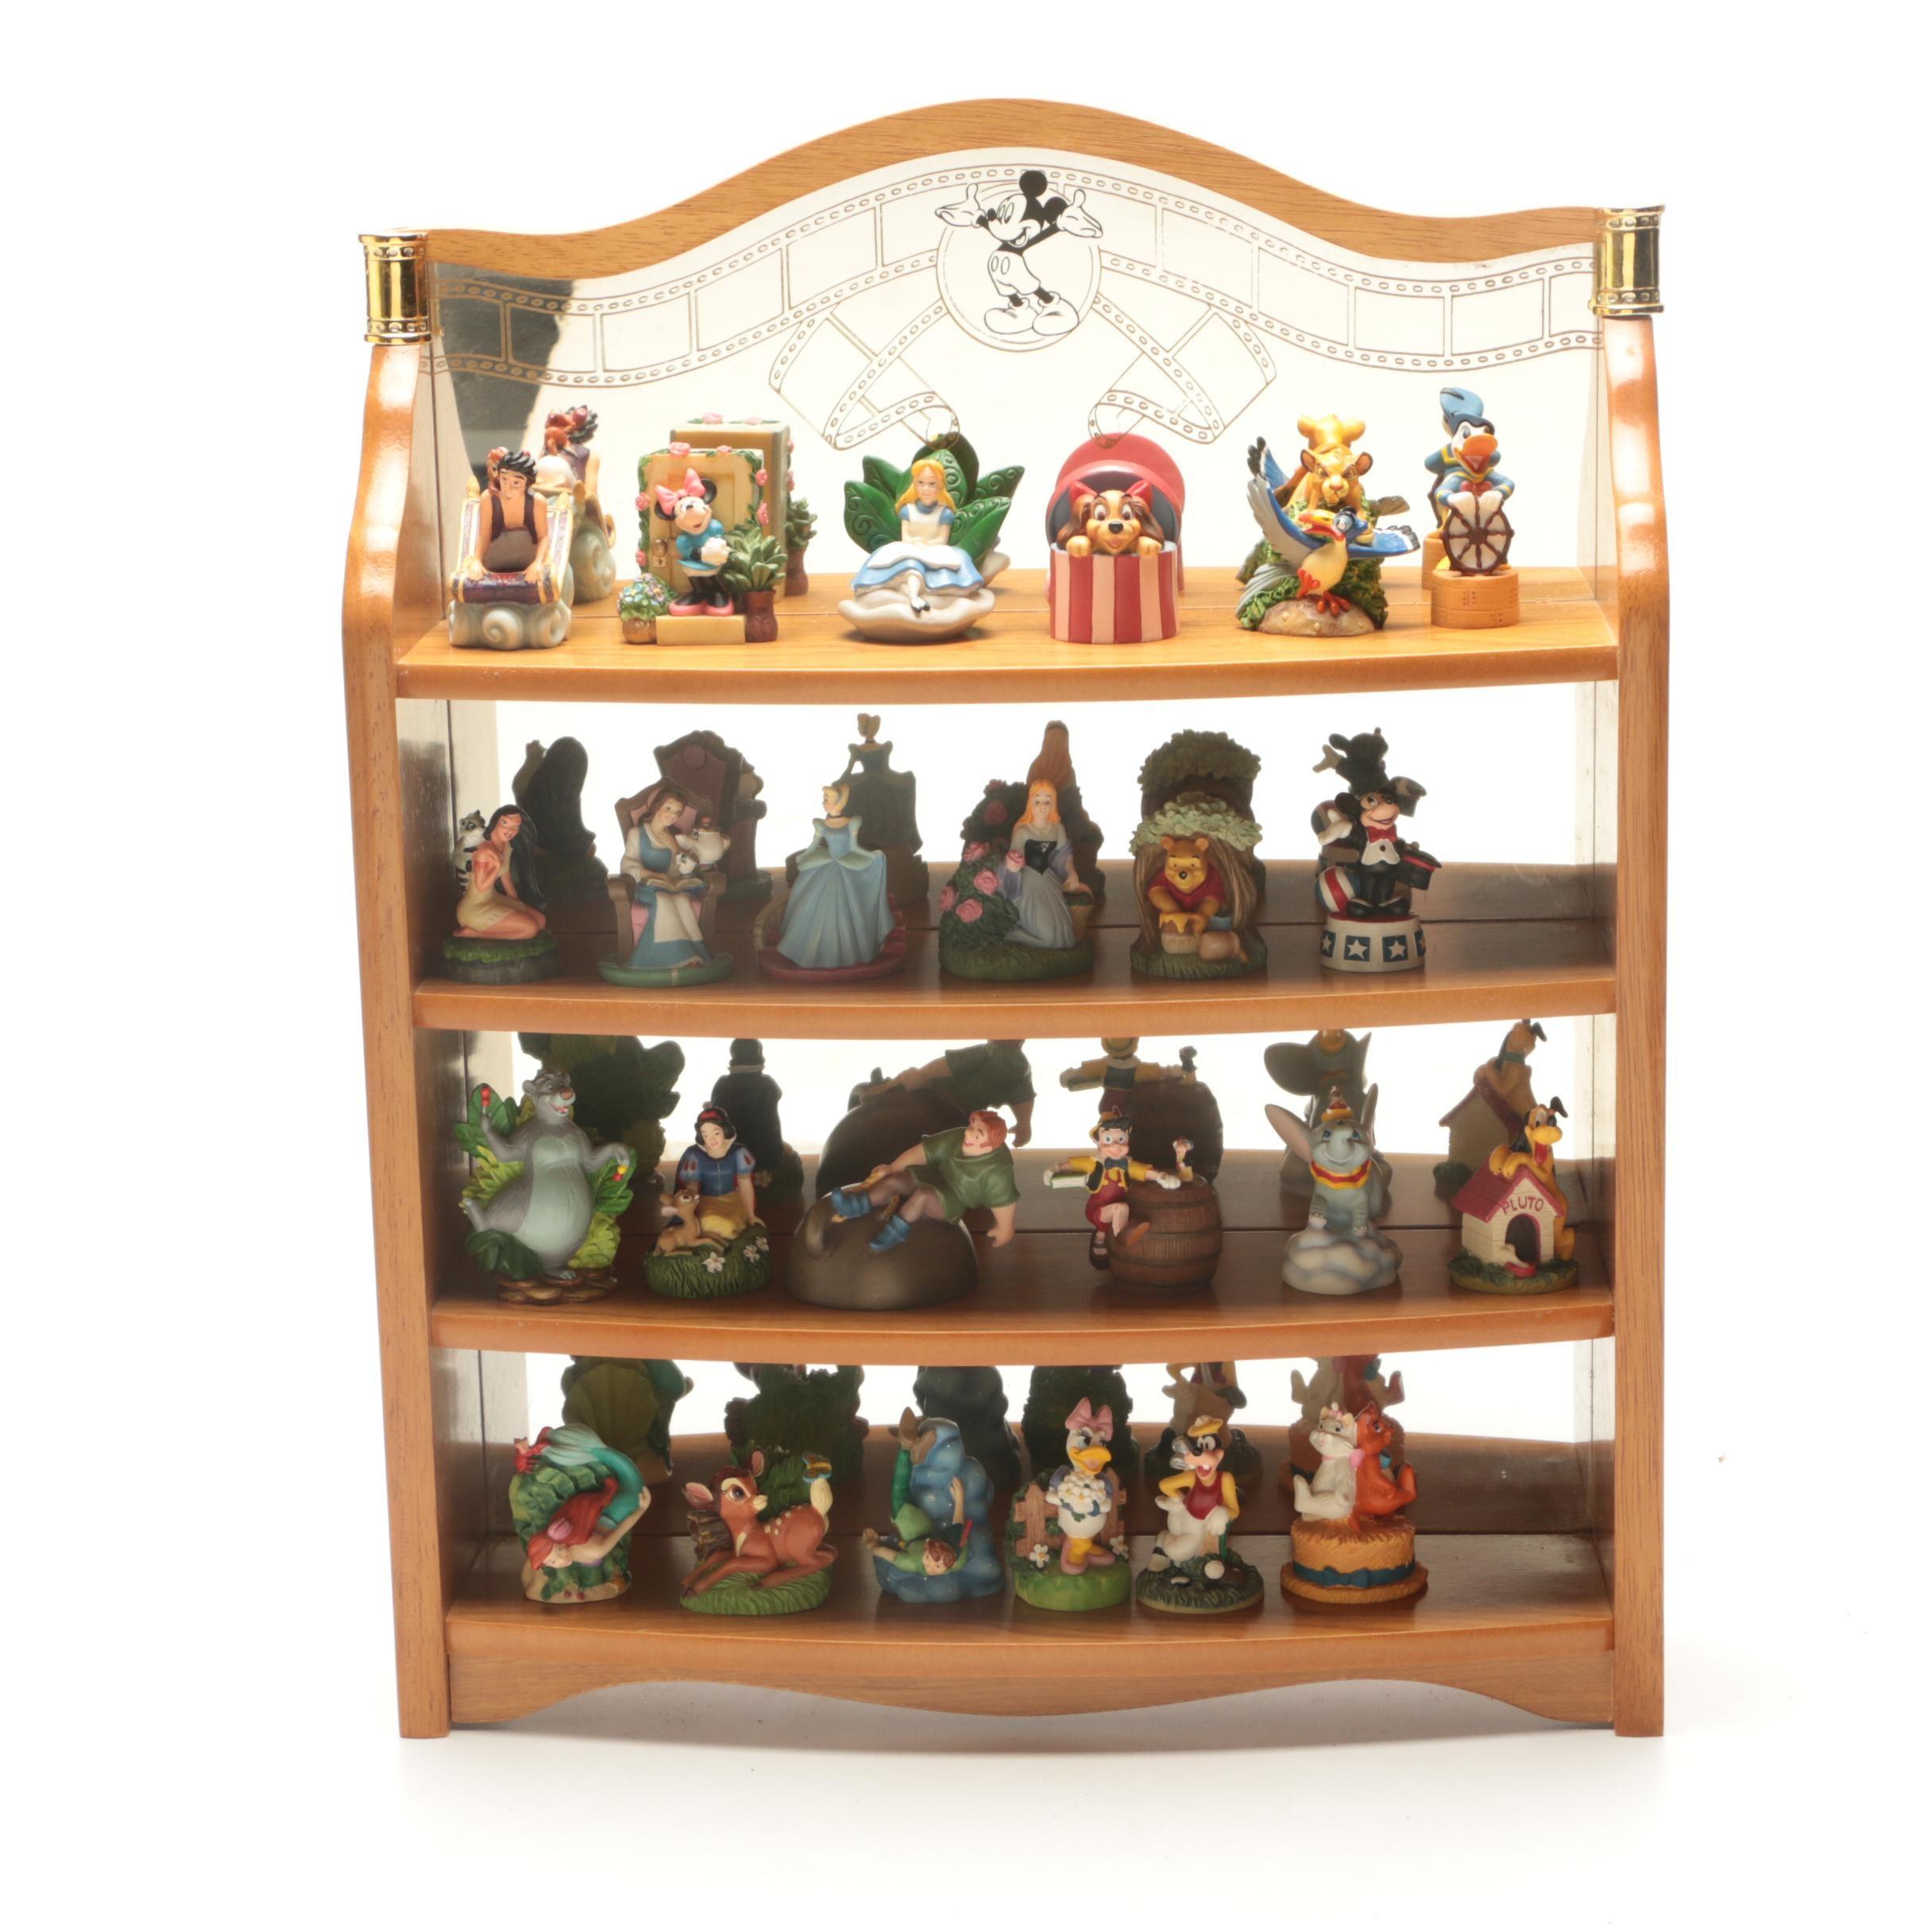 Lenox Disney Thimbles with Mirrored Display Shelf